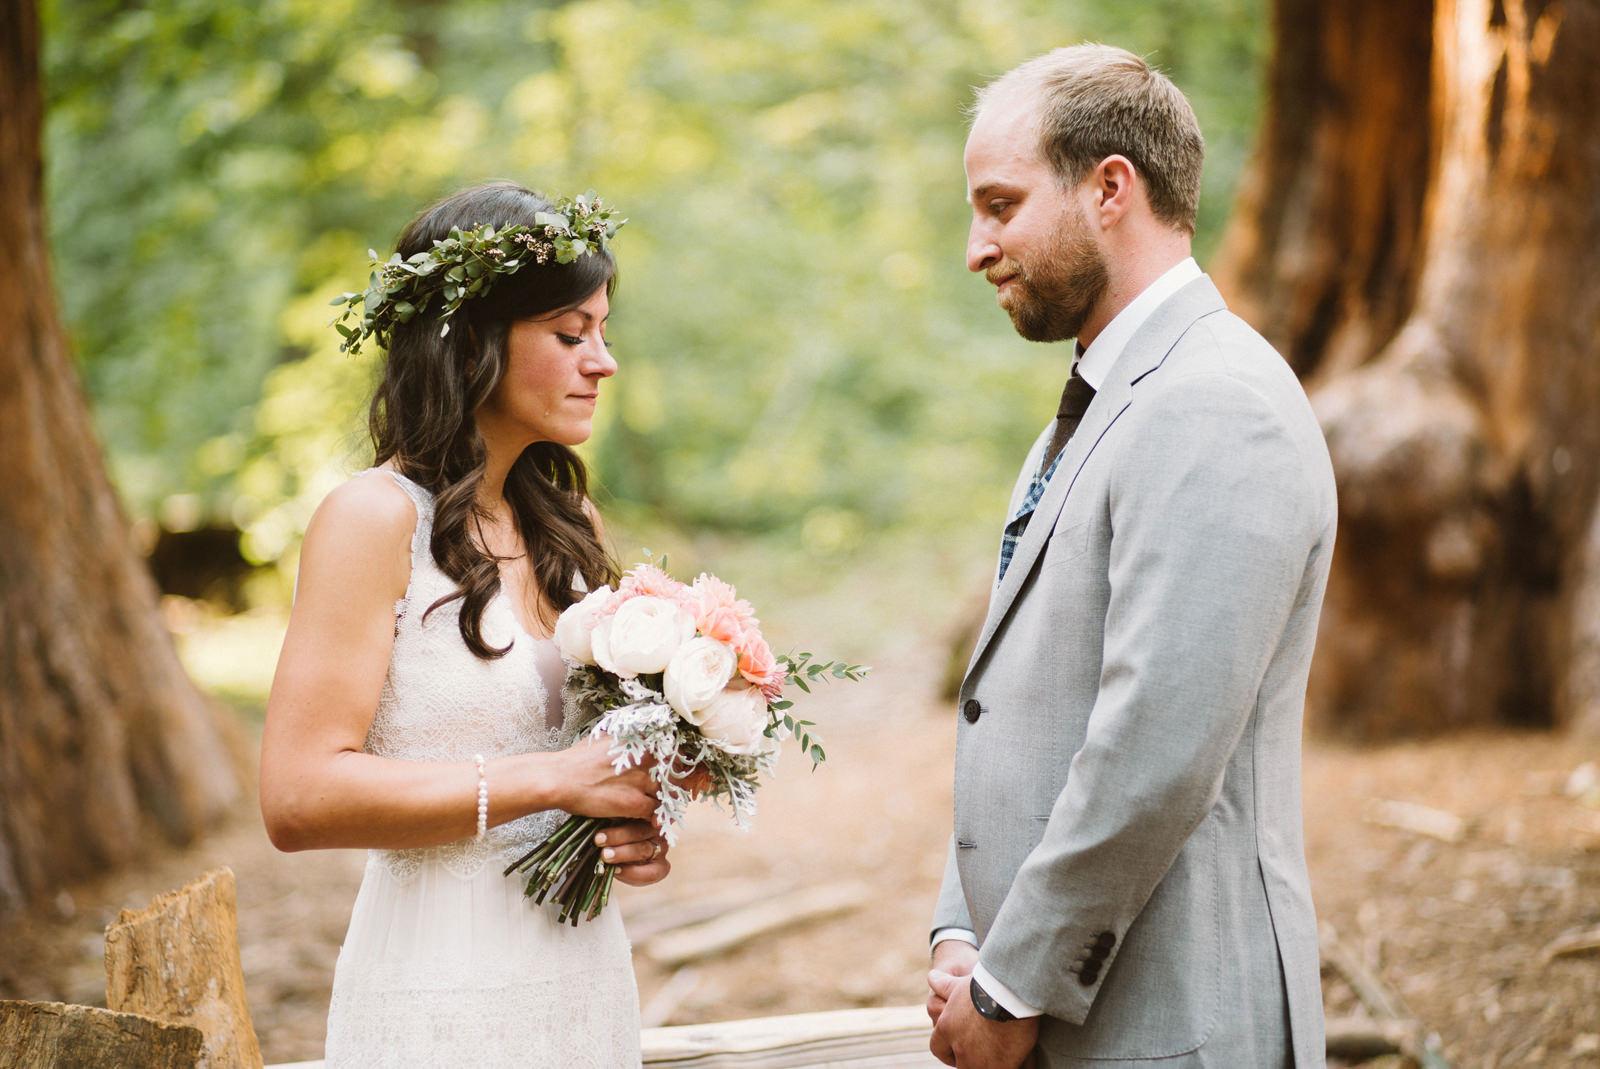 yosemite-intimate-wedding-048 YOSEMITE INTIMATE WEDDING